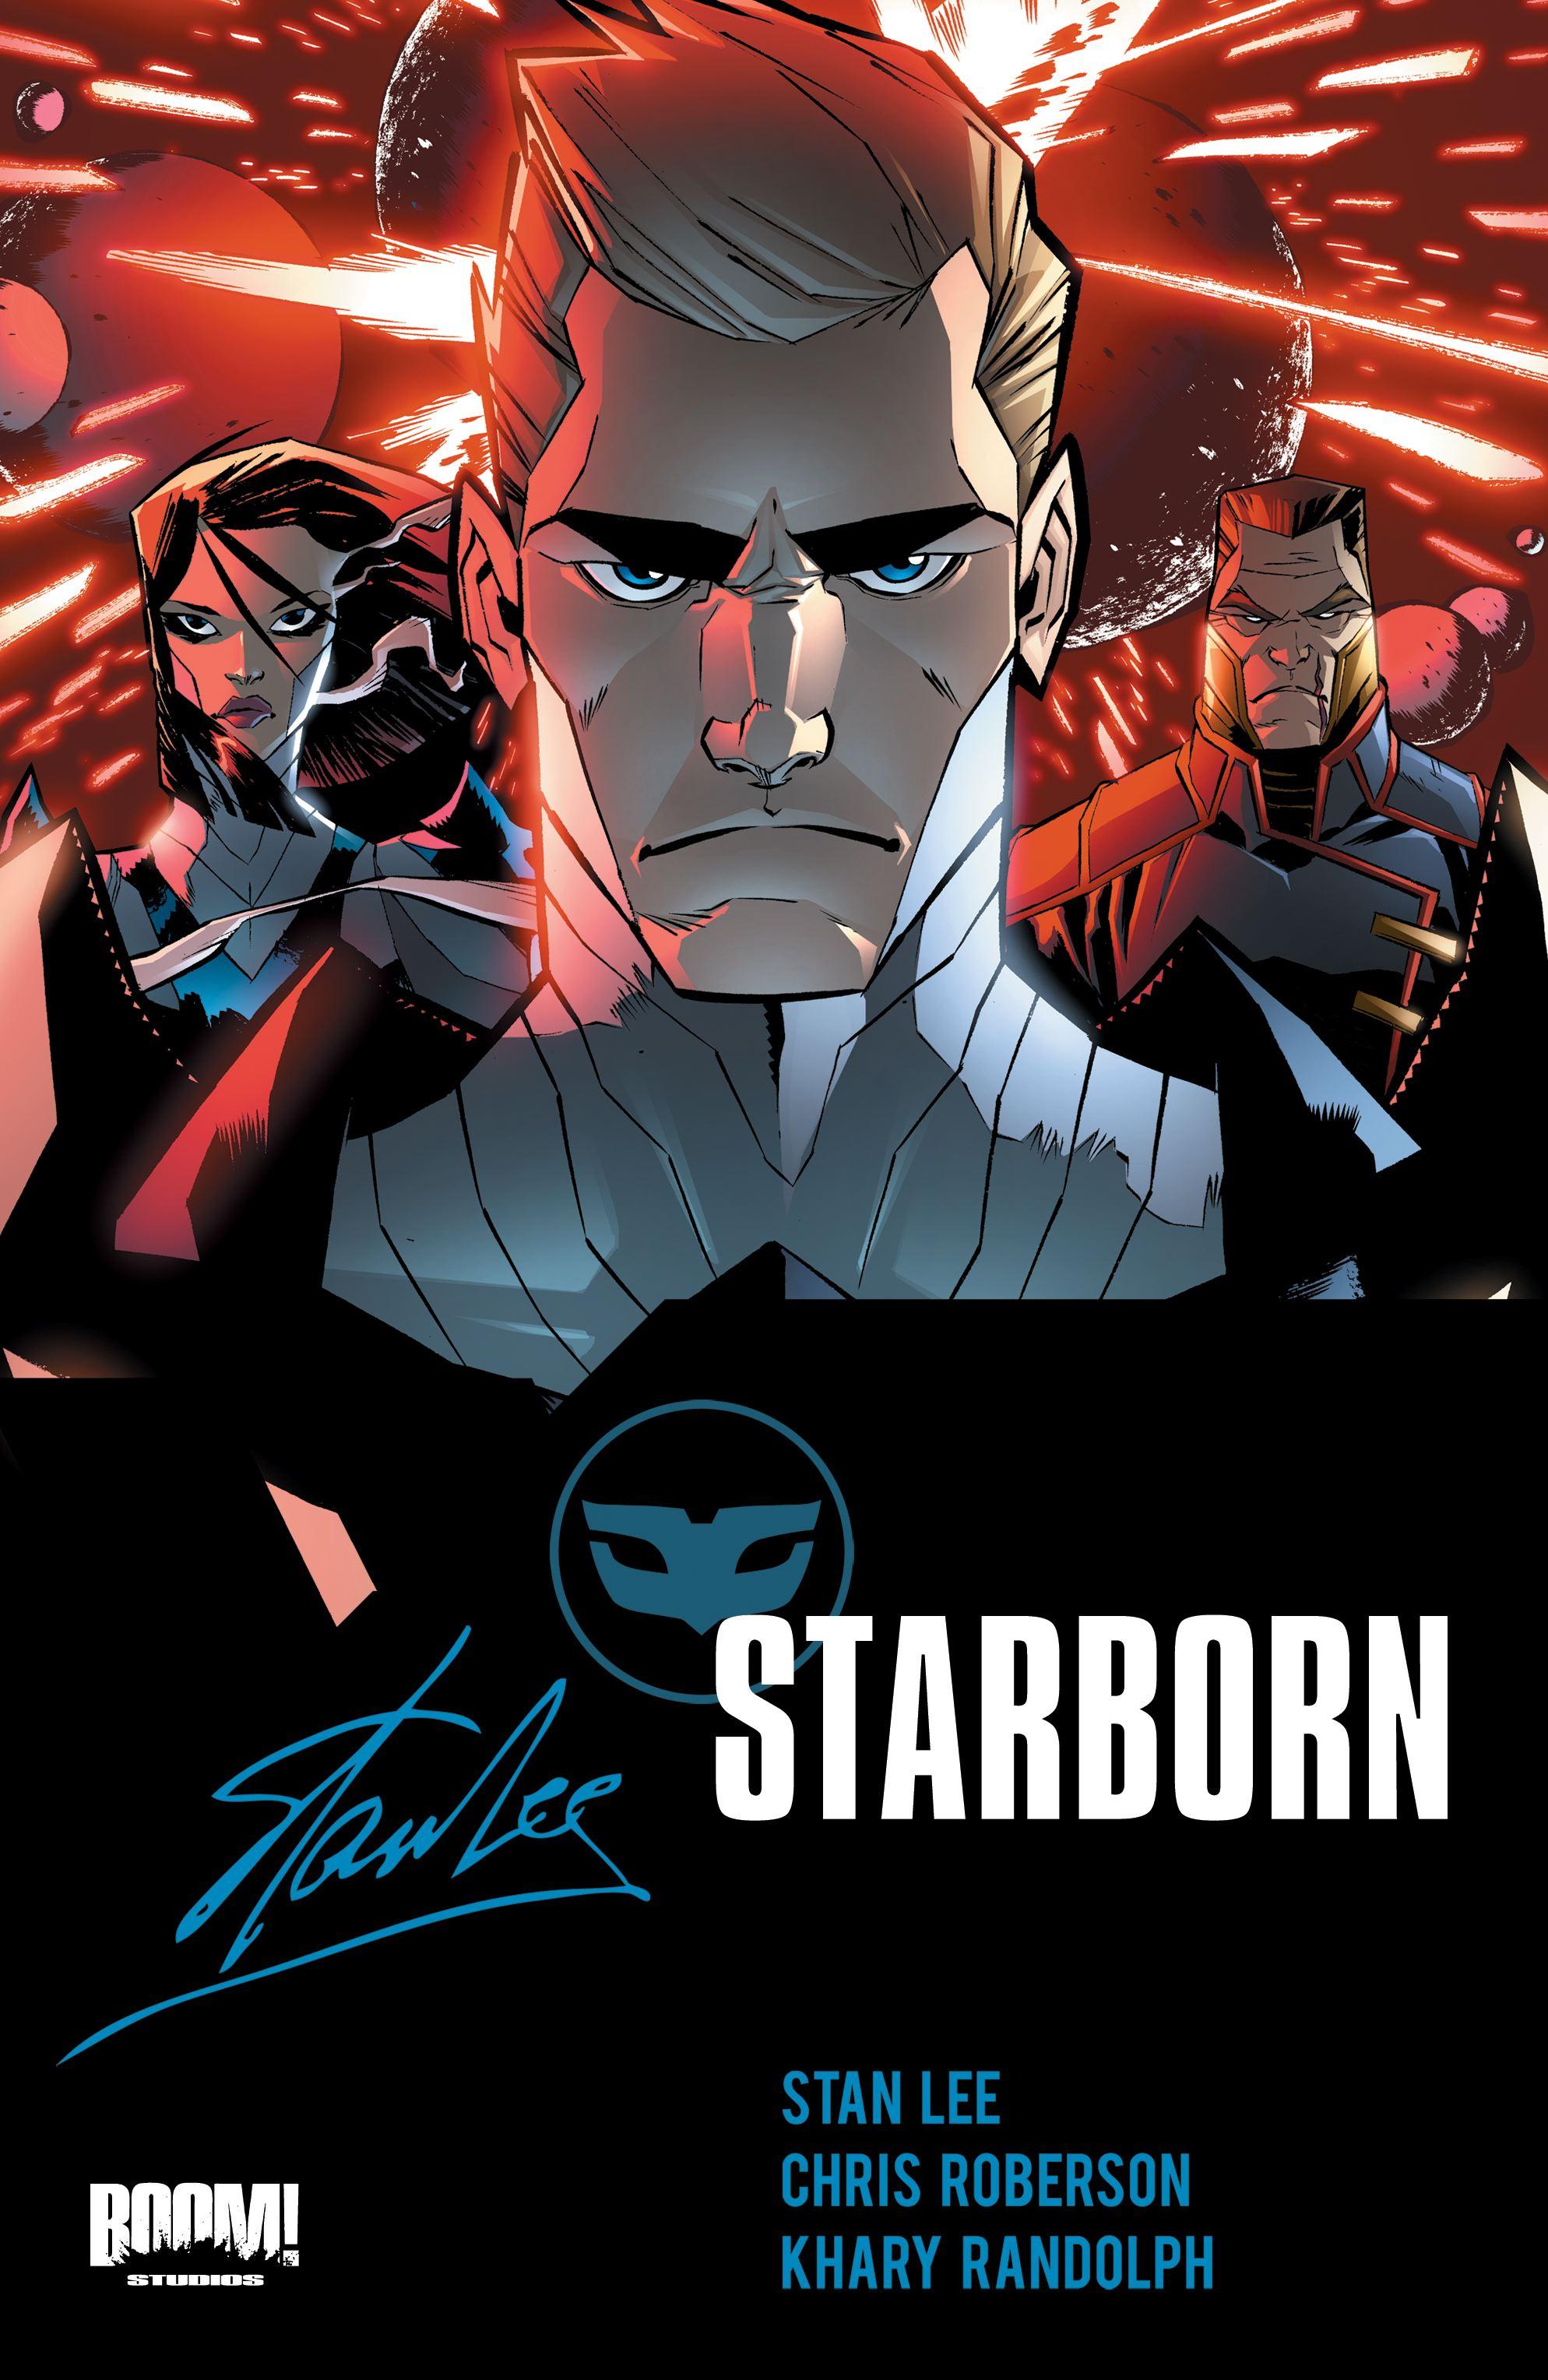 Starborn vol 3 9781608860883 hr